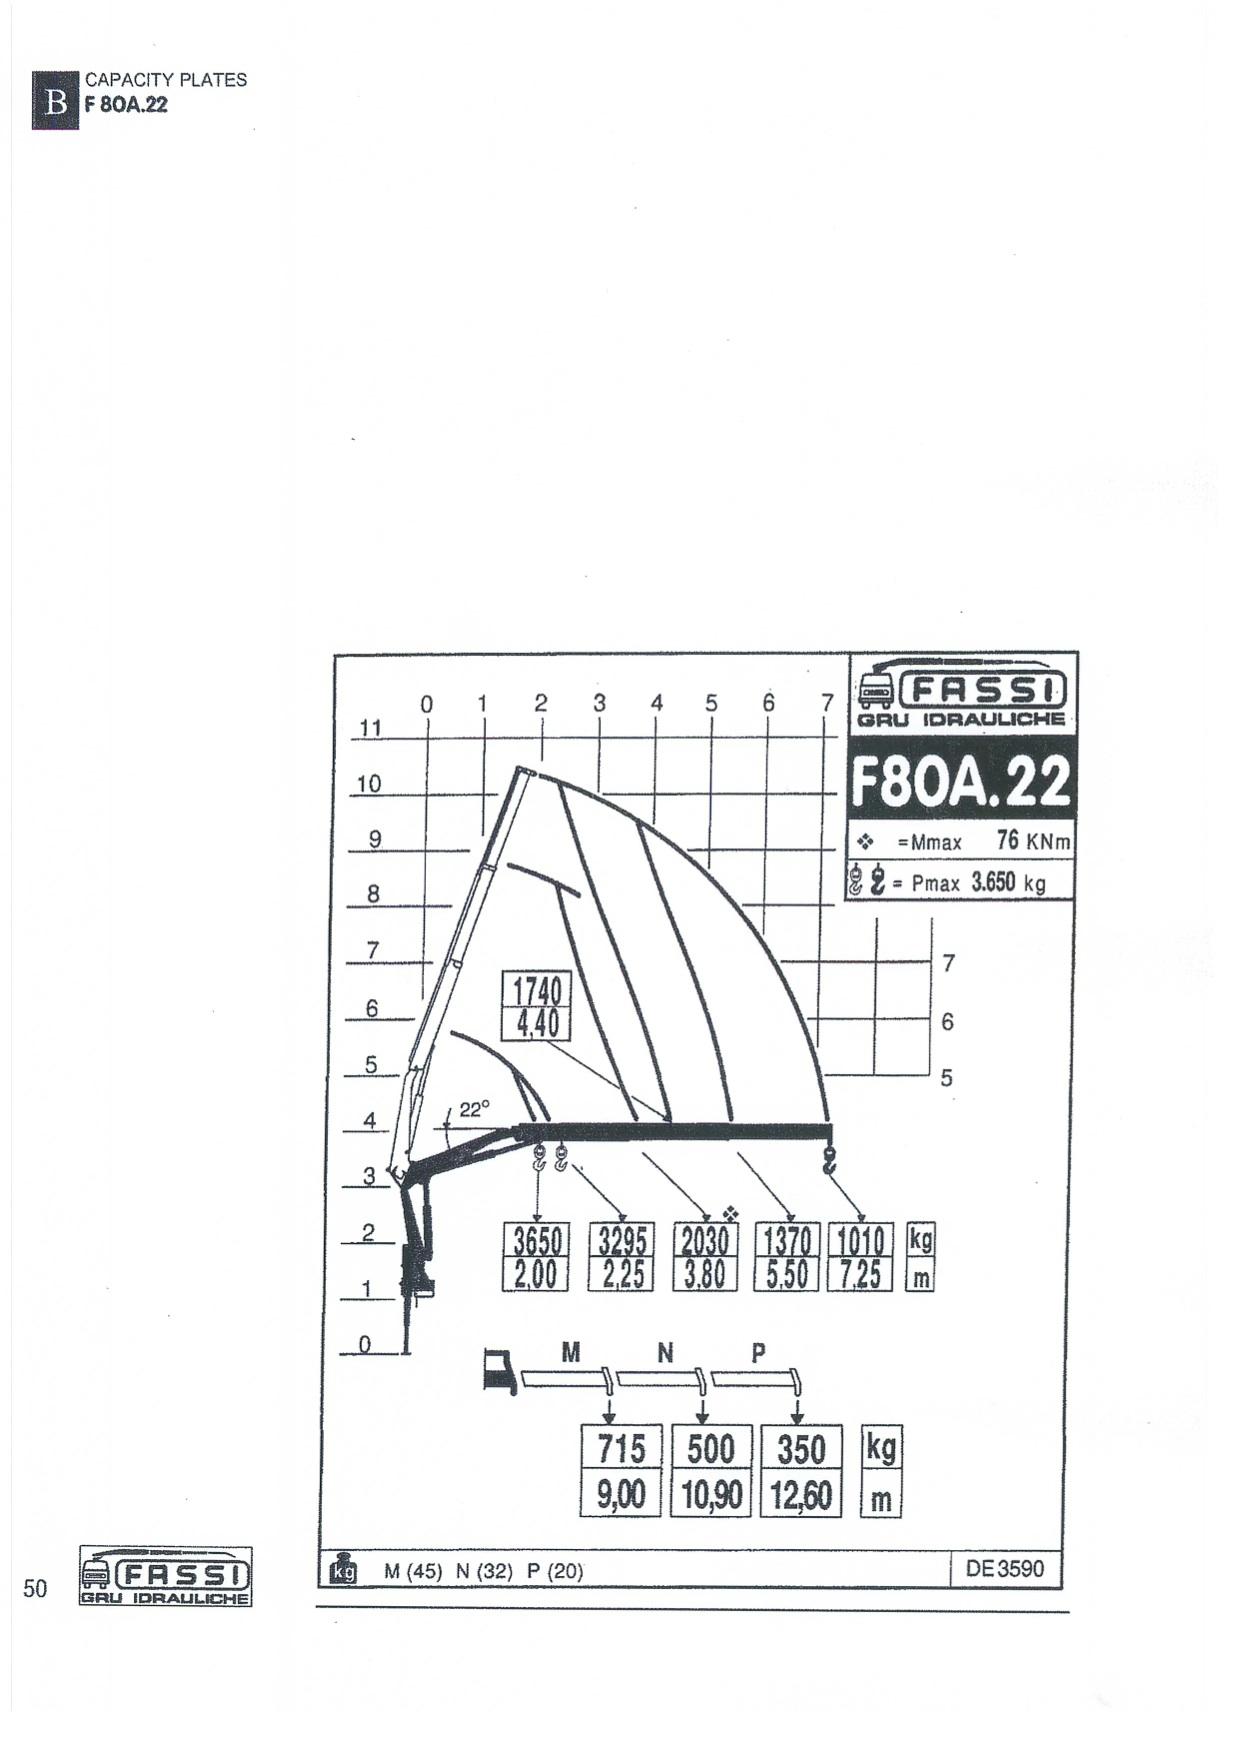 RAILON-Hirail-Crane-Truck-Isuzu-FVR13-Load-Chart.jpg